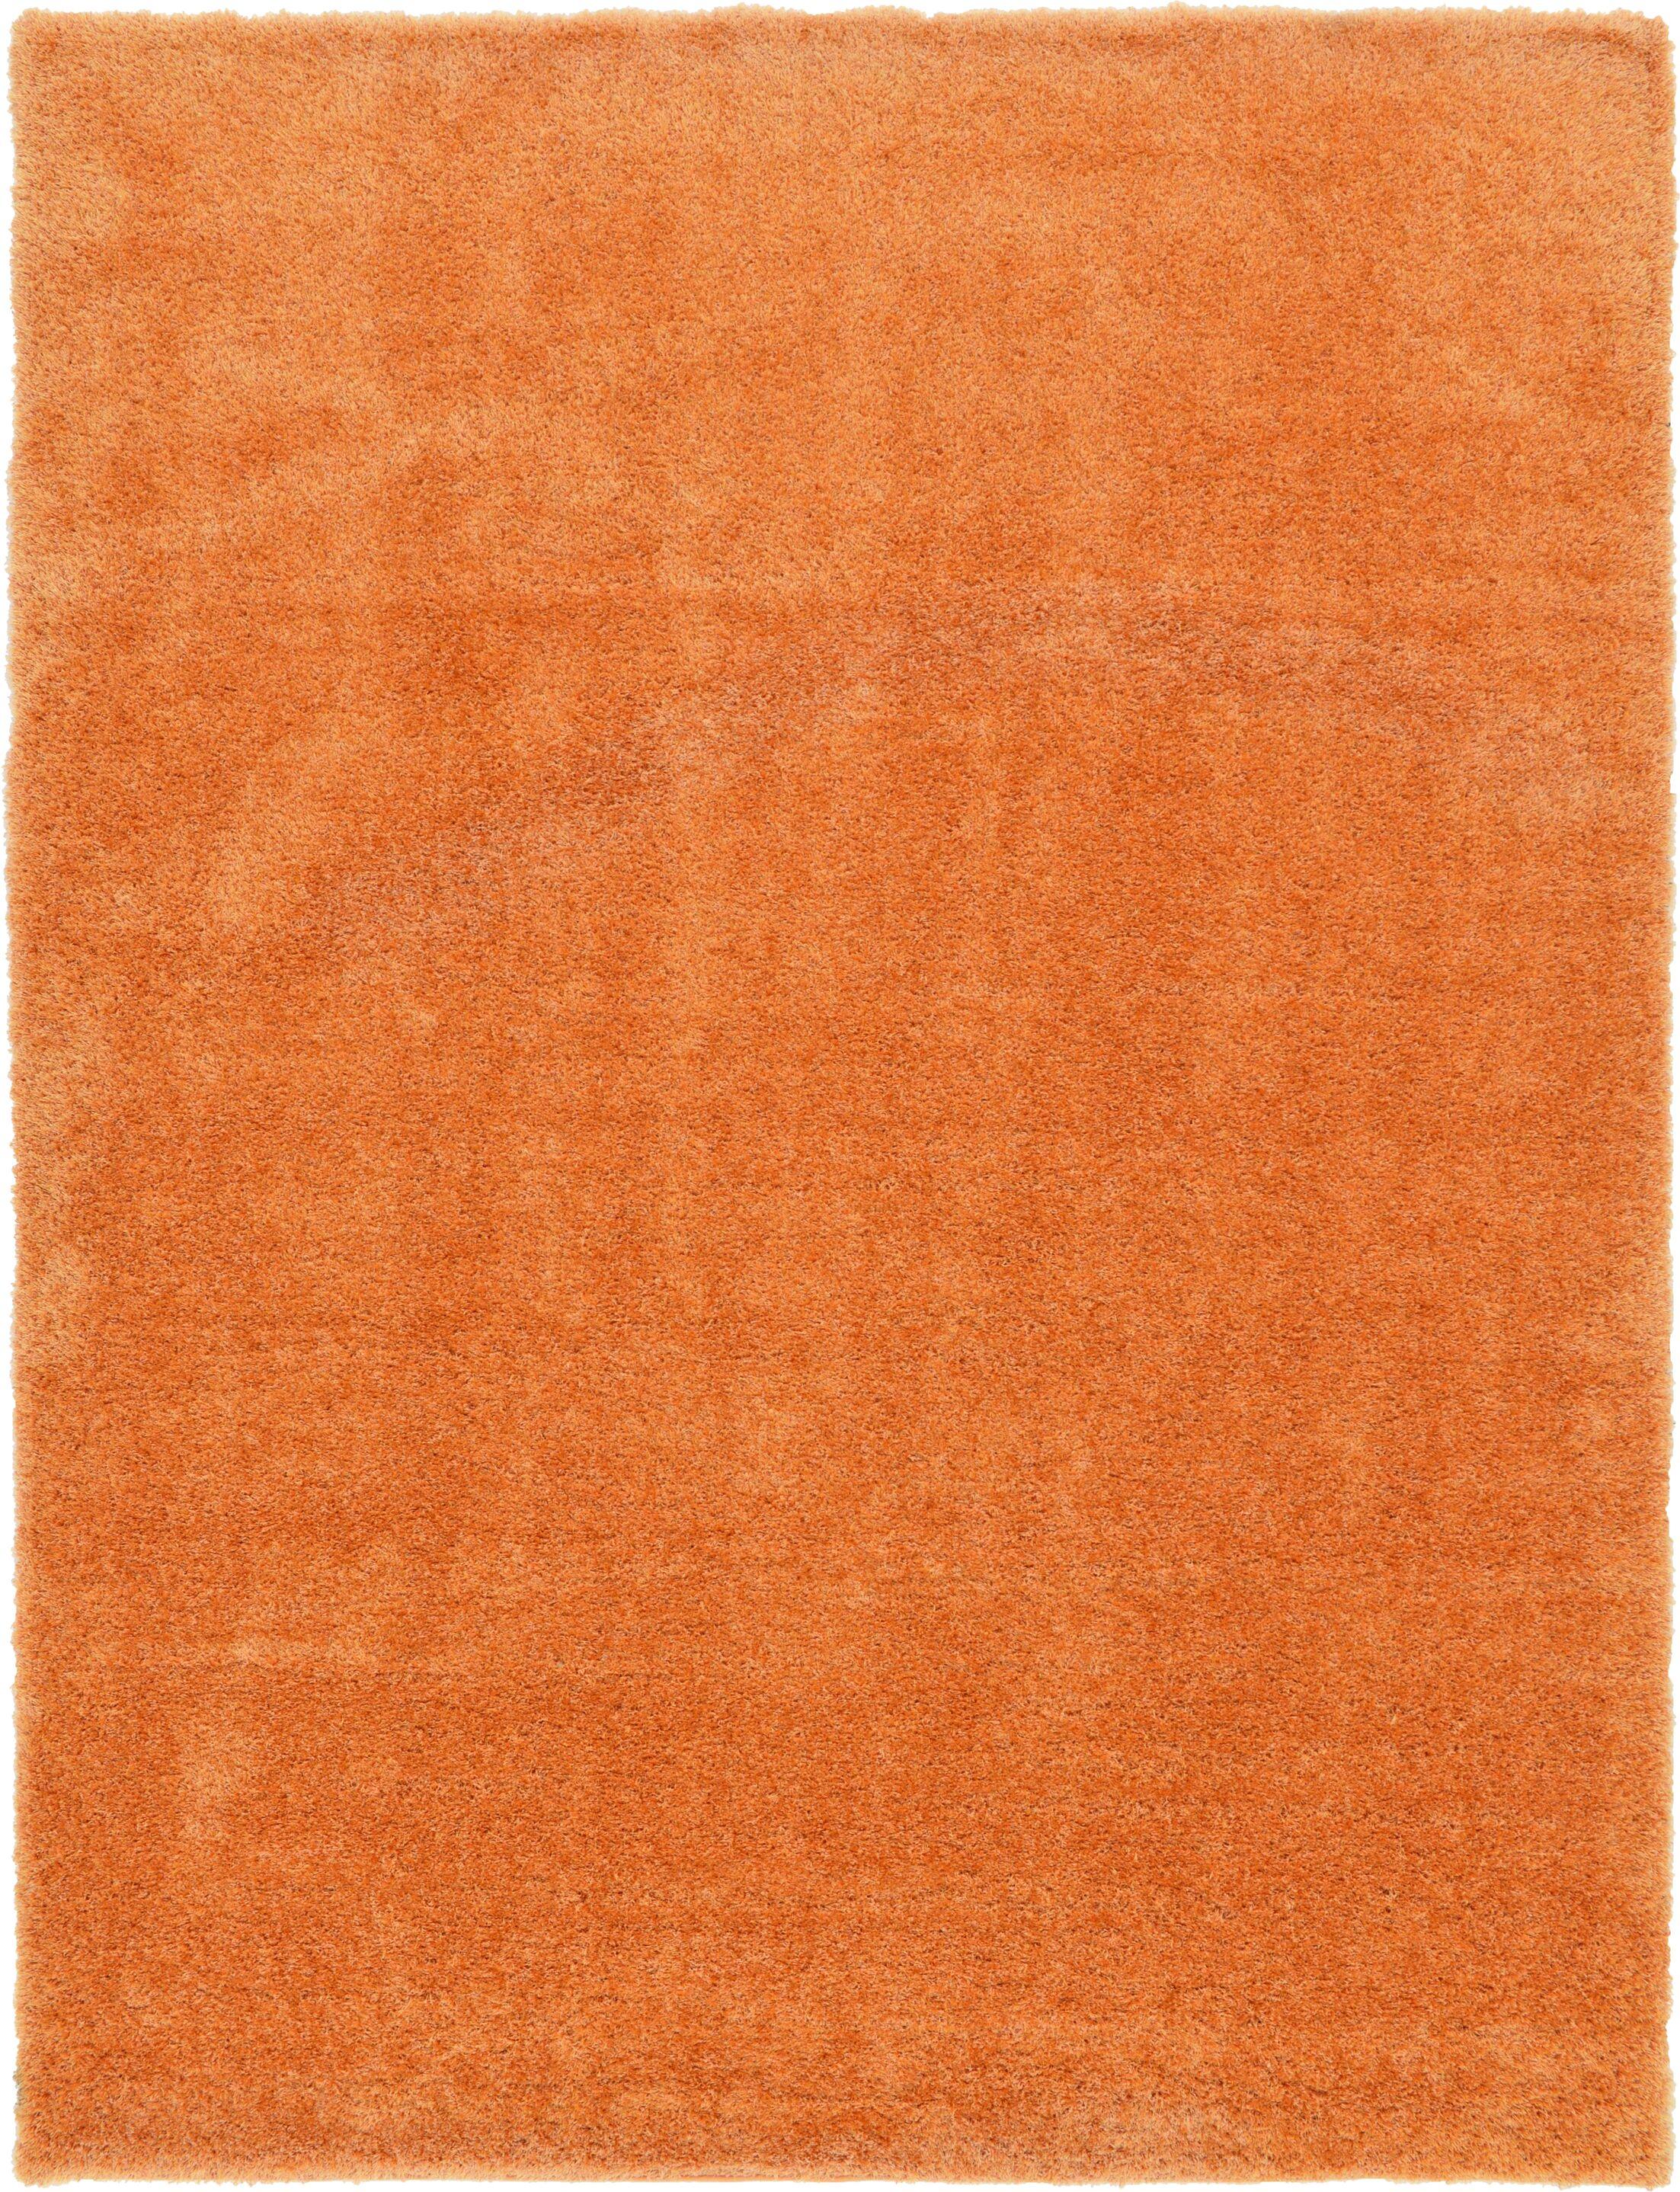 Evelyn Orange Area Rug Rug Size: Rectangle 9' x 12'